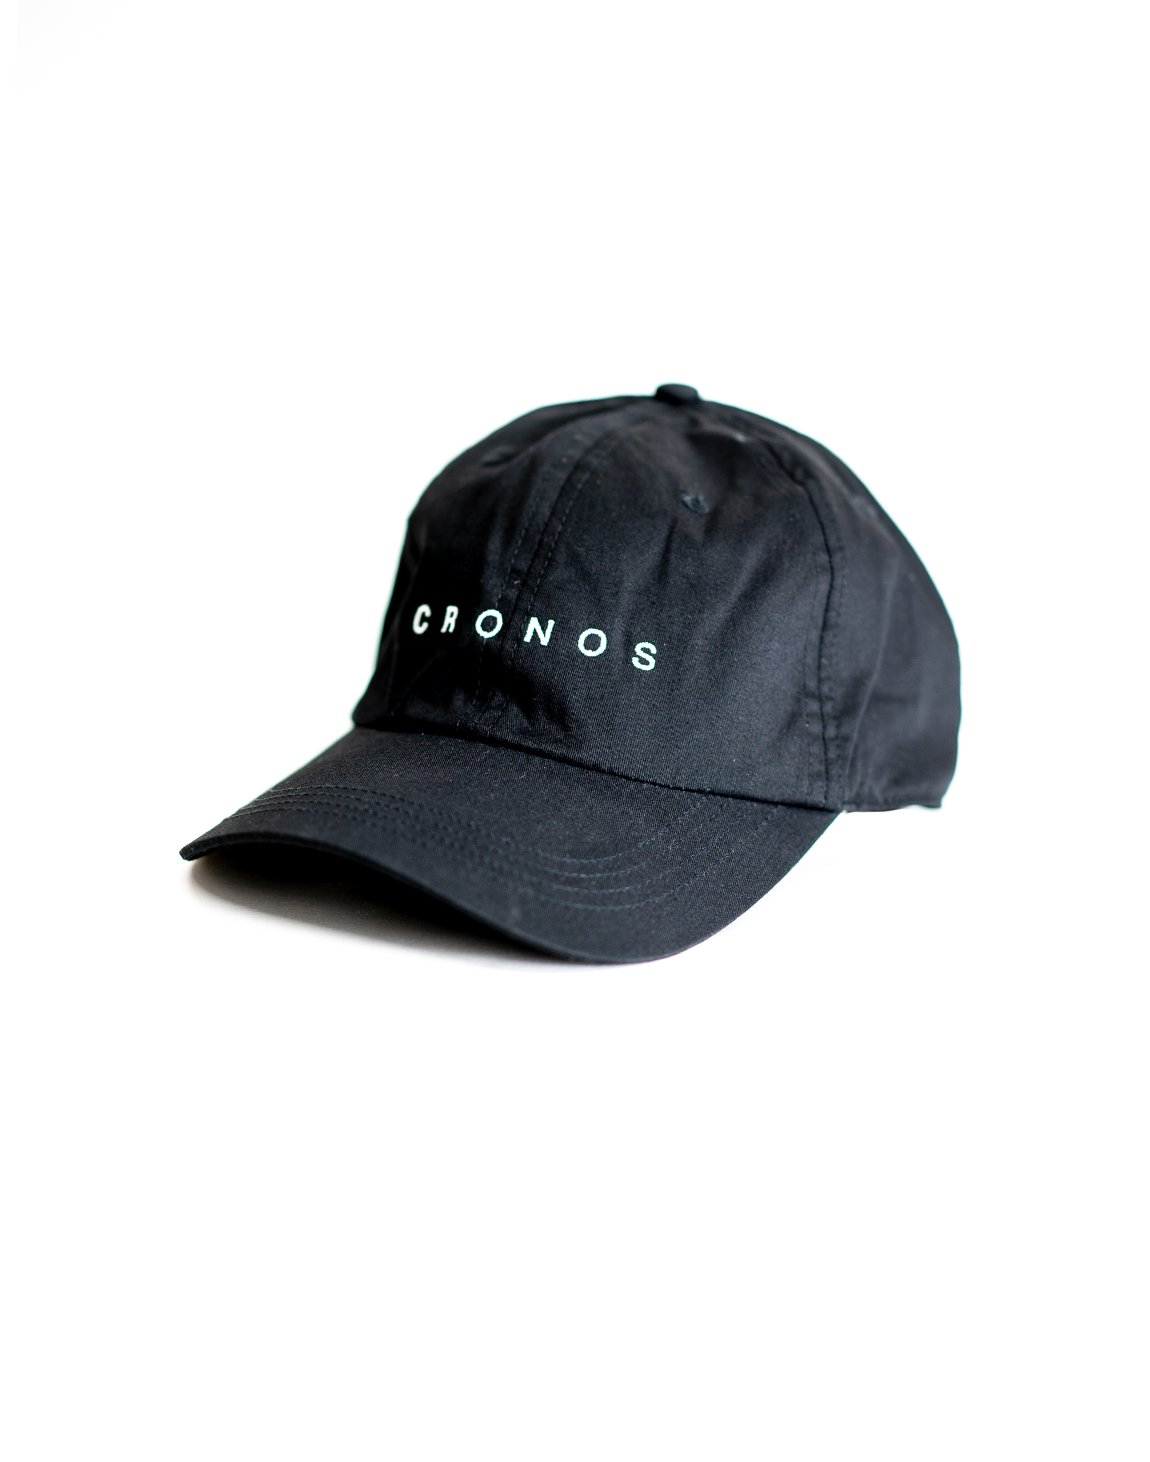 CRONOS LOGO CAP 【BLACK】